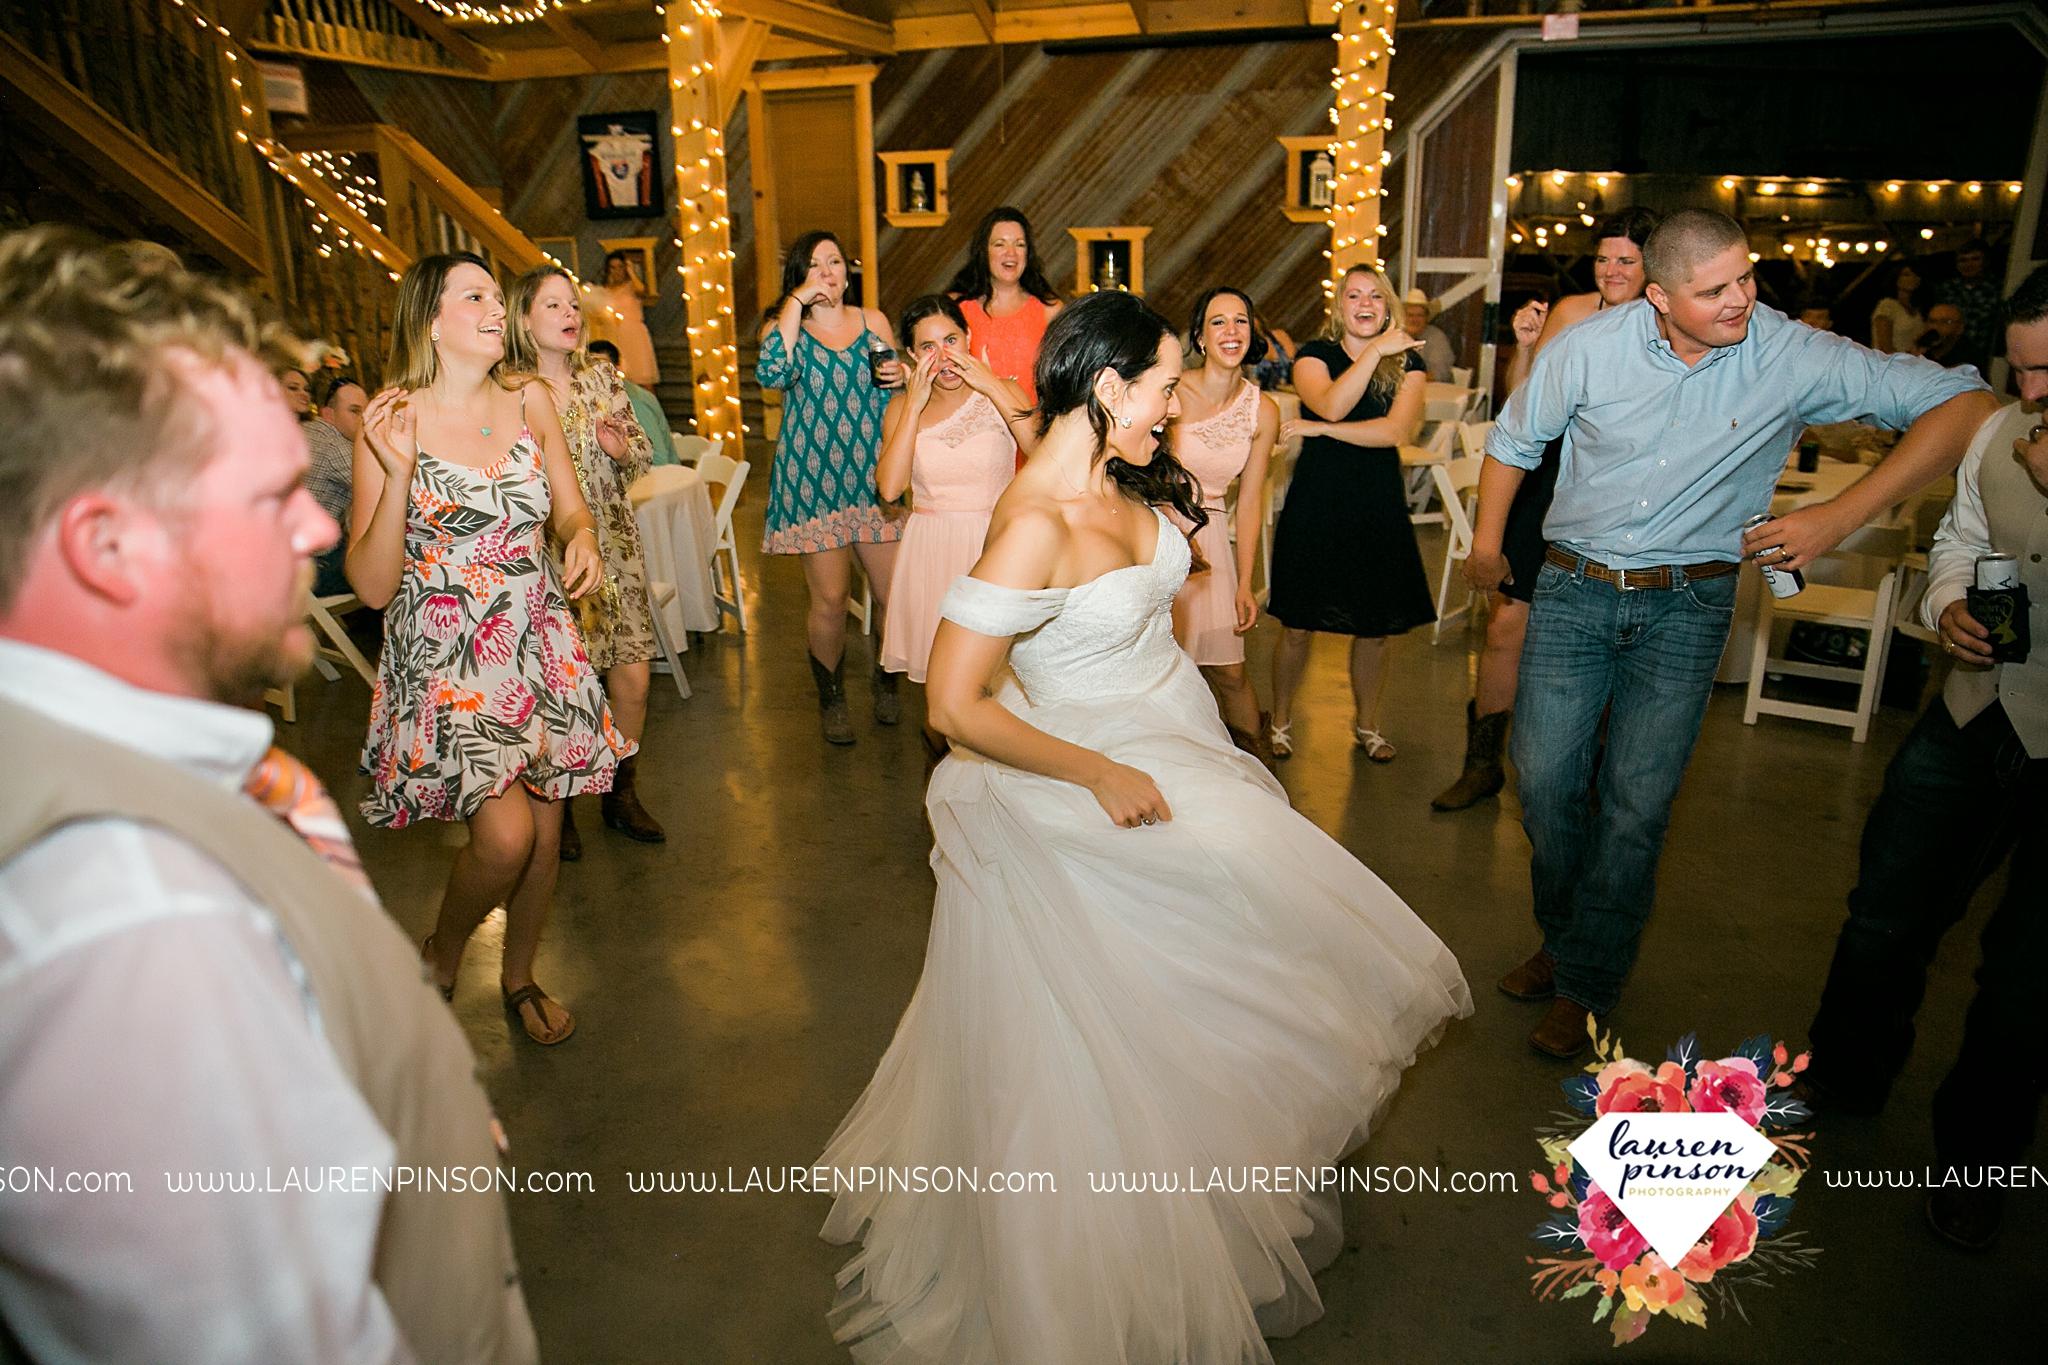 jones-barn-willow-creek-ranch-wedding-in-cleburne-texas-fort-worth-dfw-wichita-falls-wedding-photography_3263.jpg